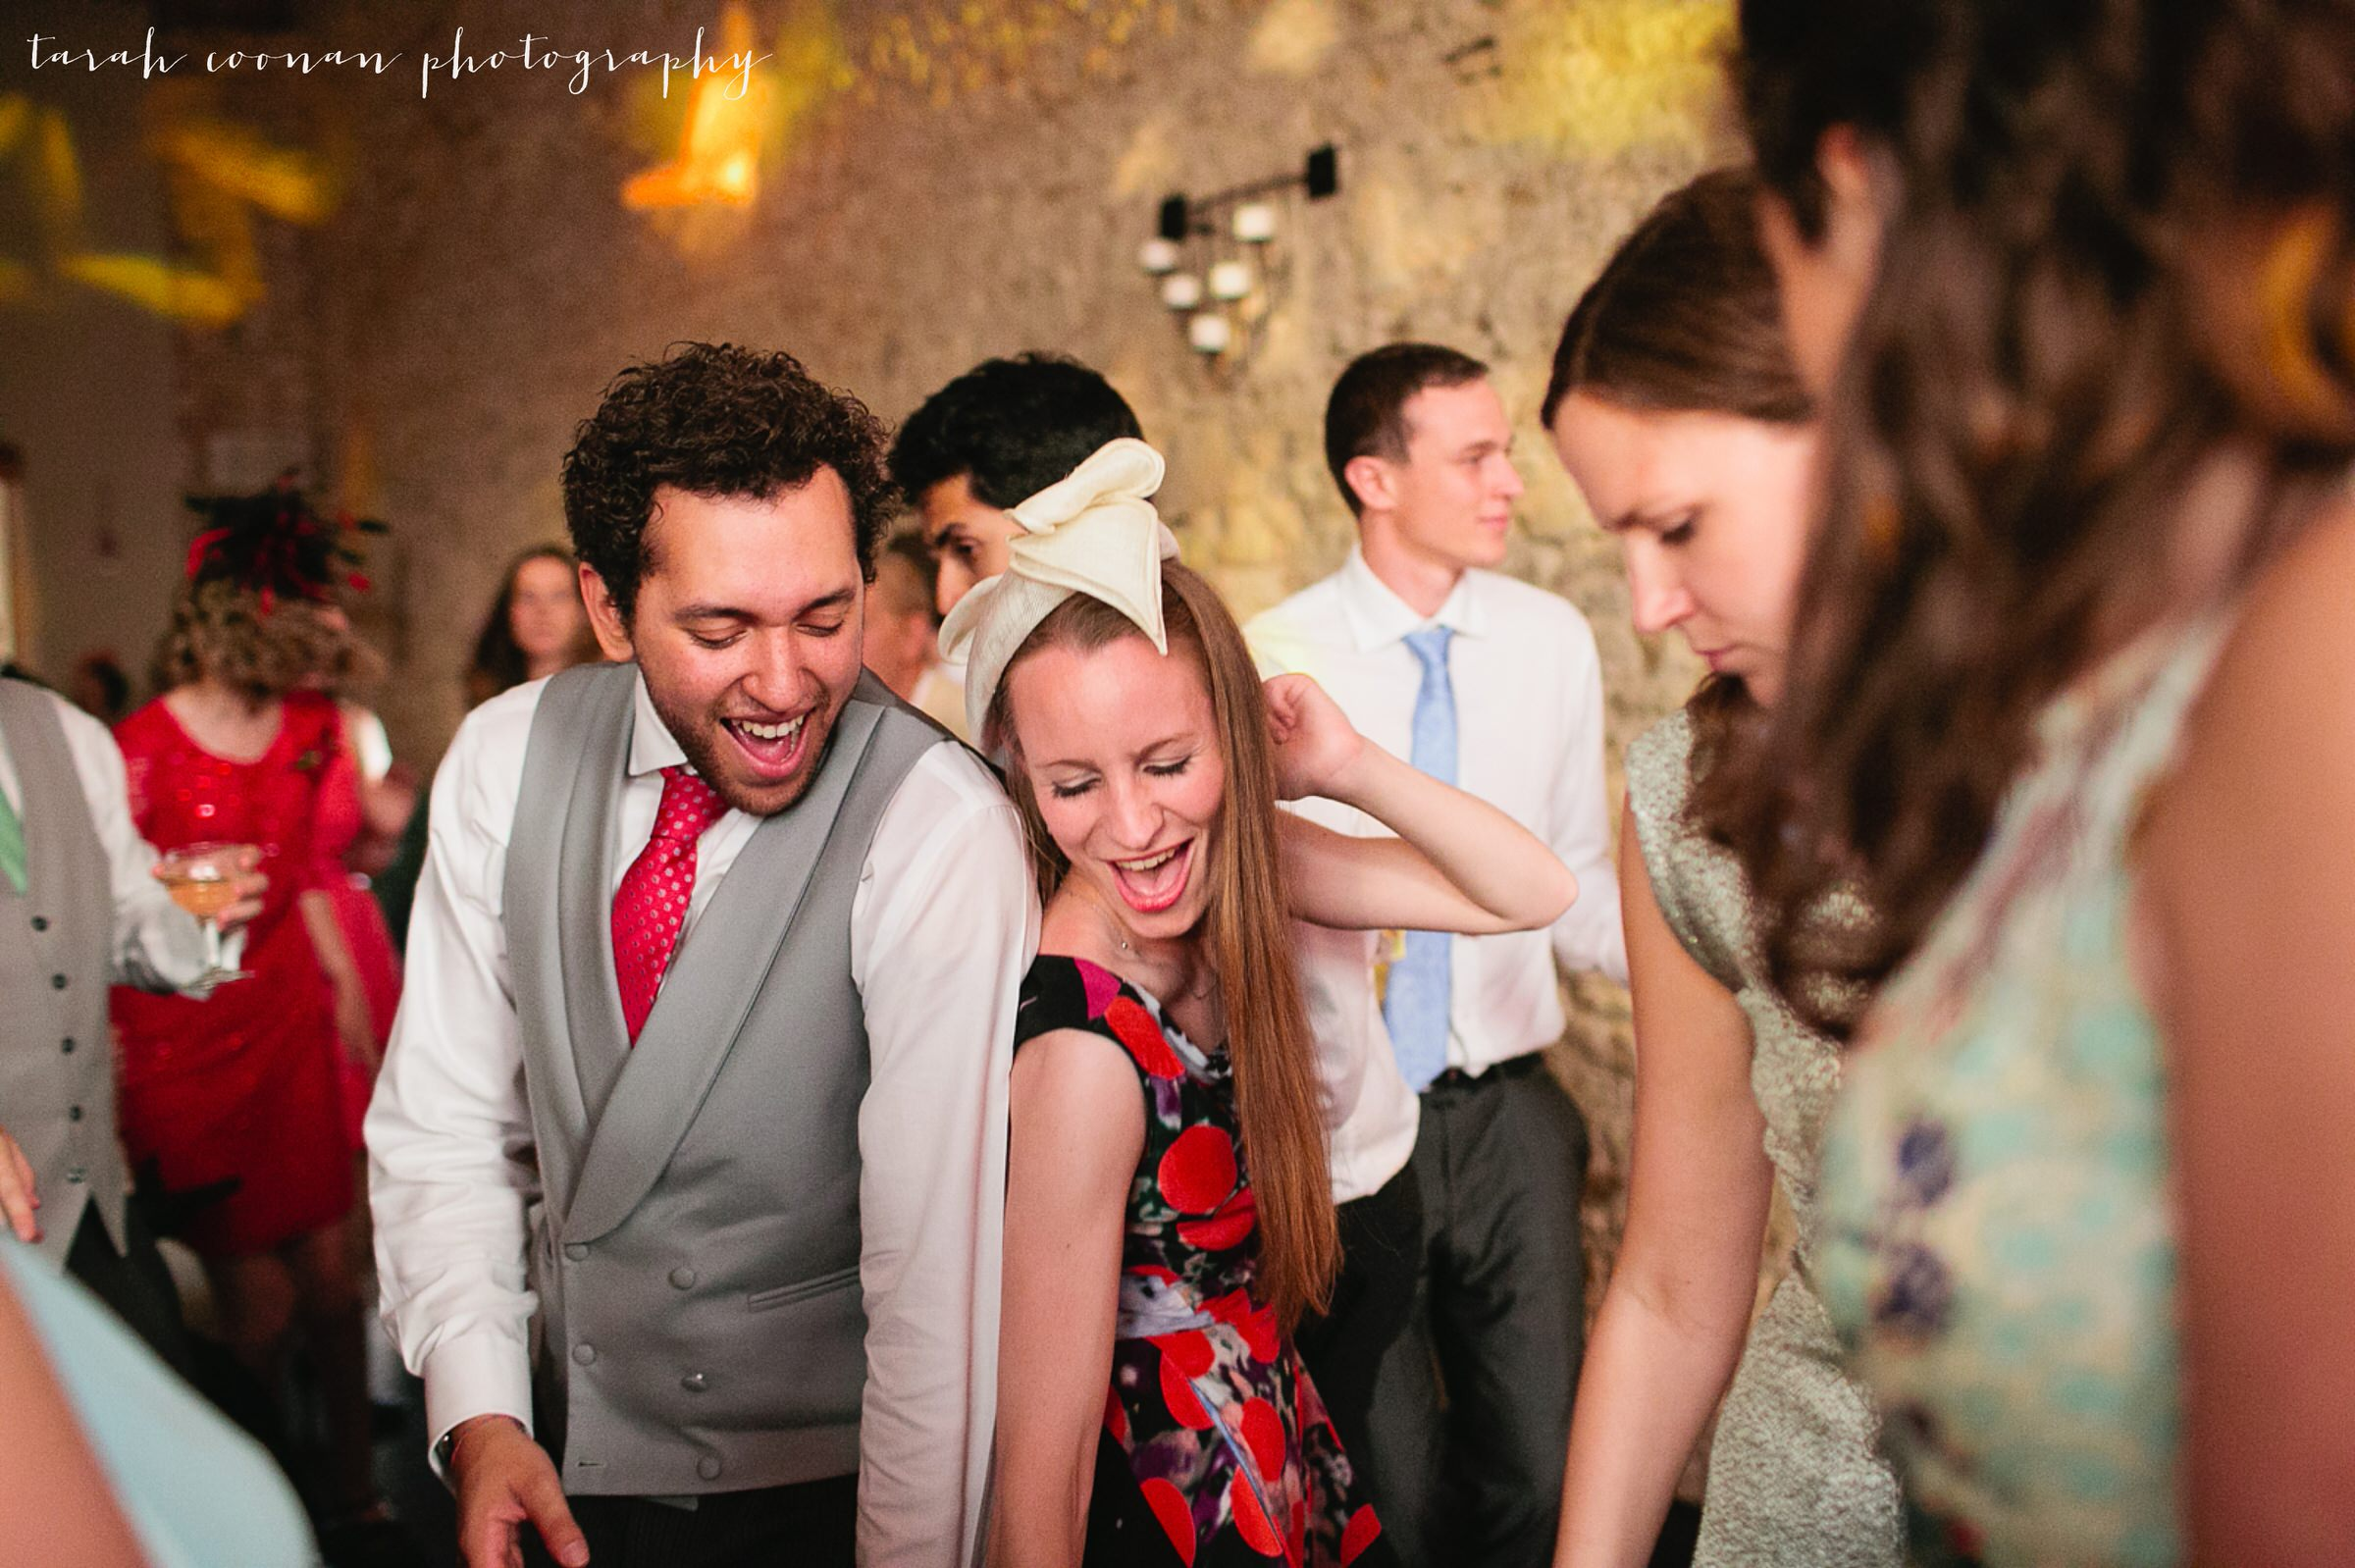 brighton-wedding-photographer109